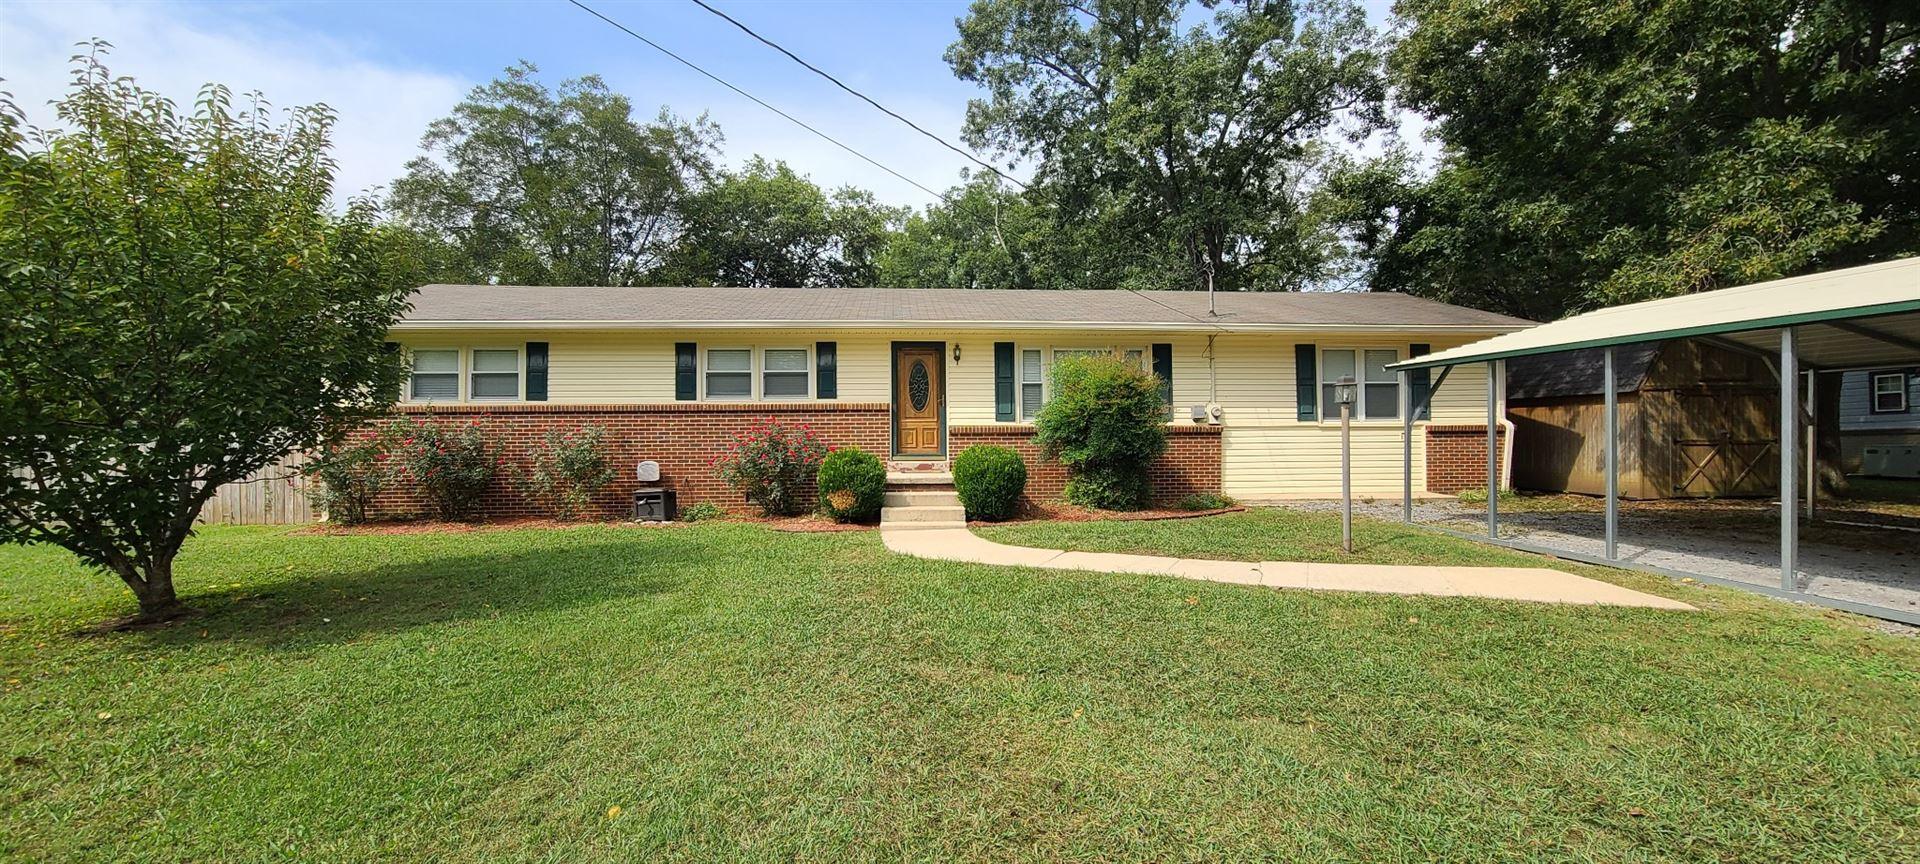 108 Tremont Dr, Shelbyville, TN 37160 - MLS#: 2298621